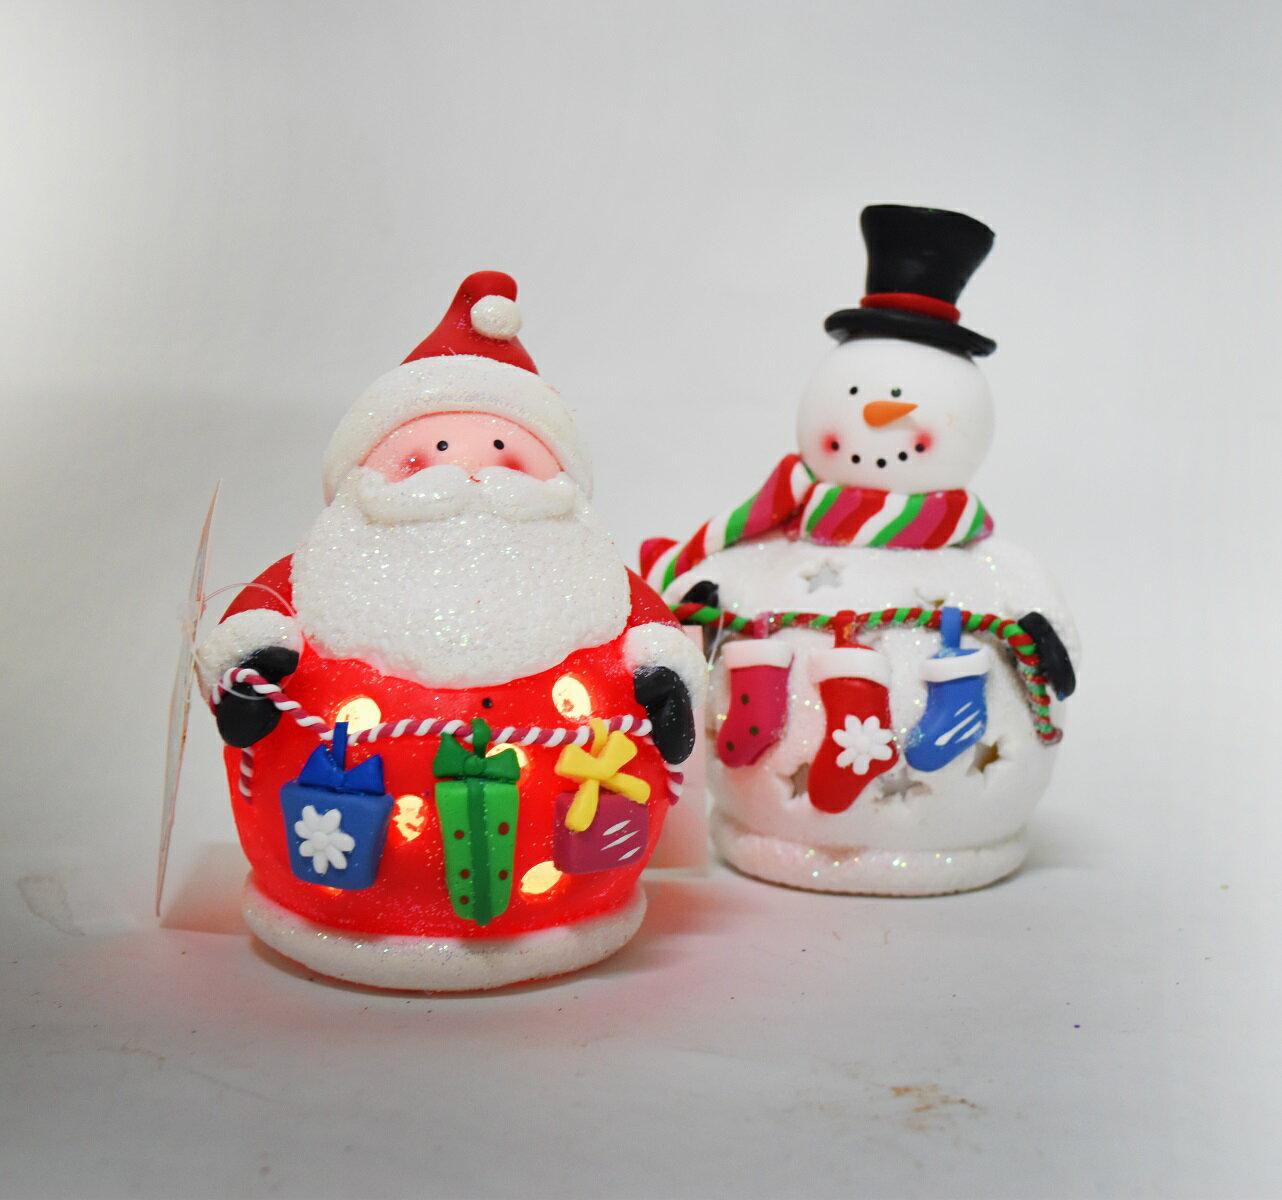 X射線【X389122】5吋LED聖誕造型玩偶擺飾,聖誕節/聖誕樹/聖誕佈置/聖誕掛飾/裝飾/掛飾/會場佈置/DIY/材料包